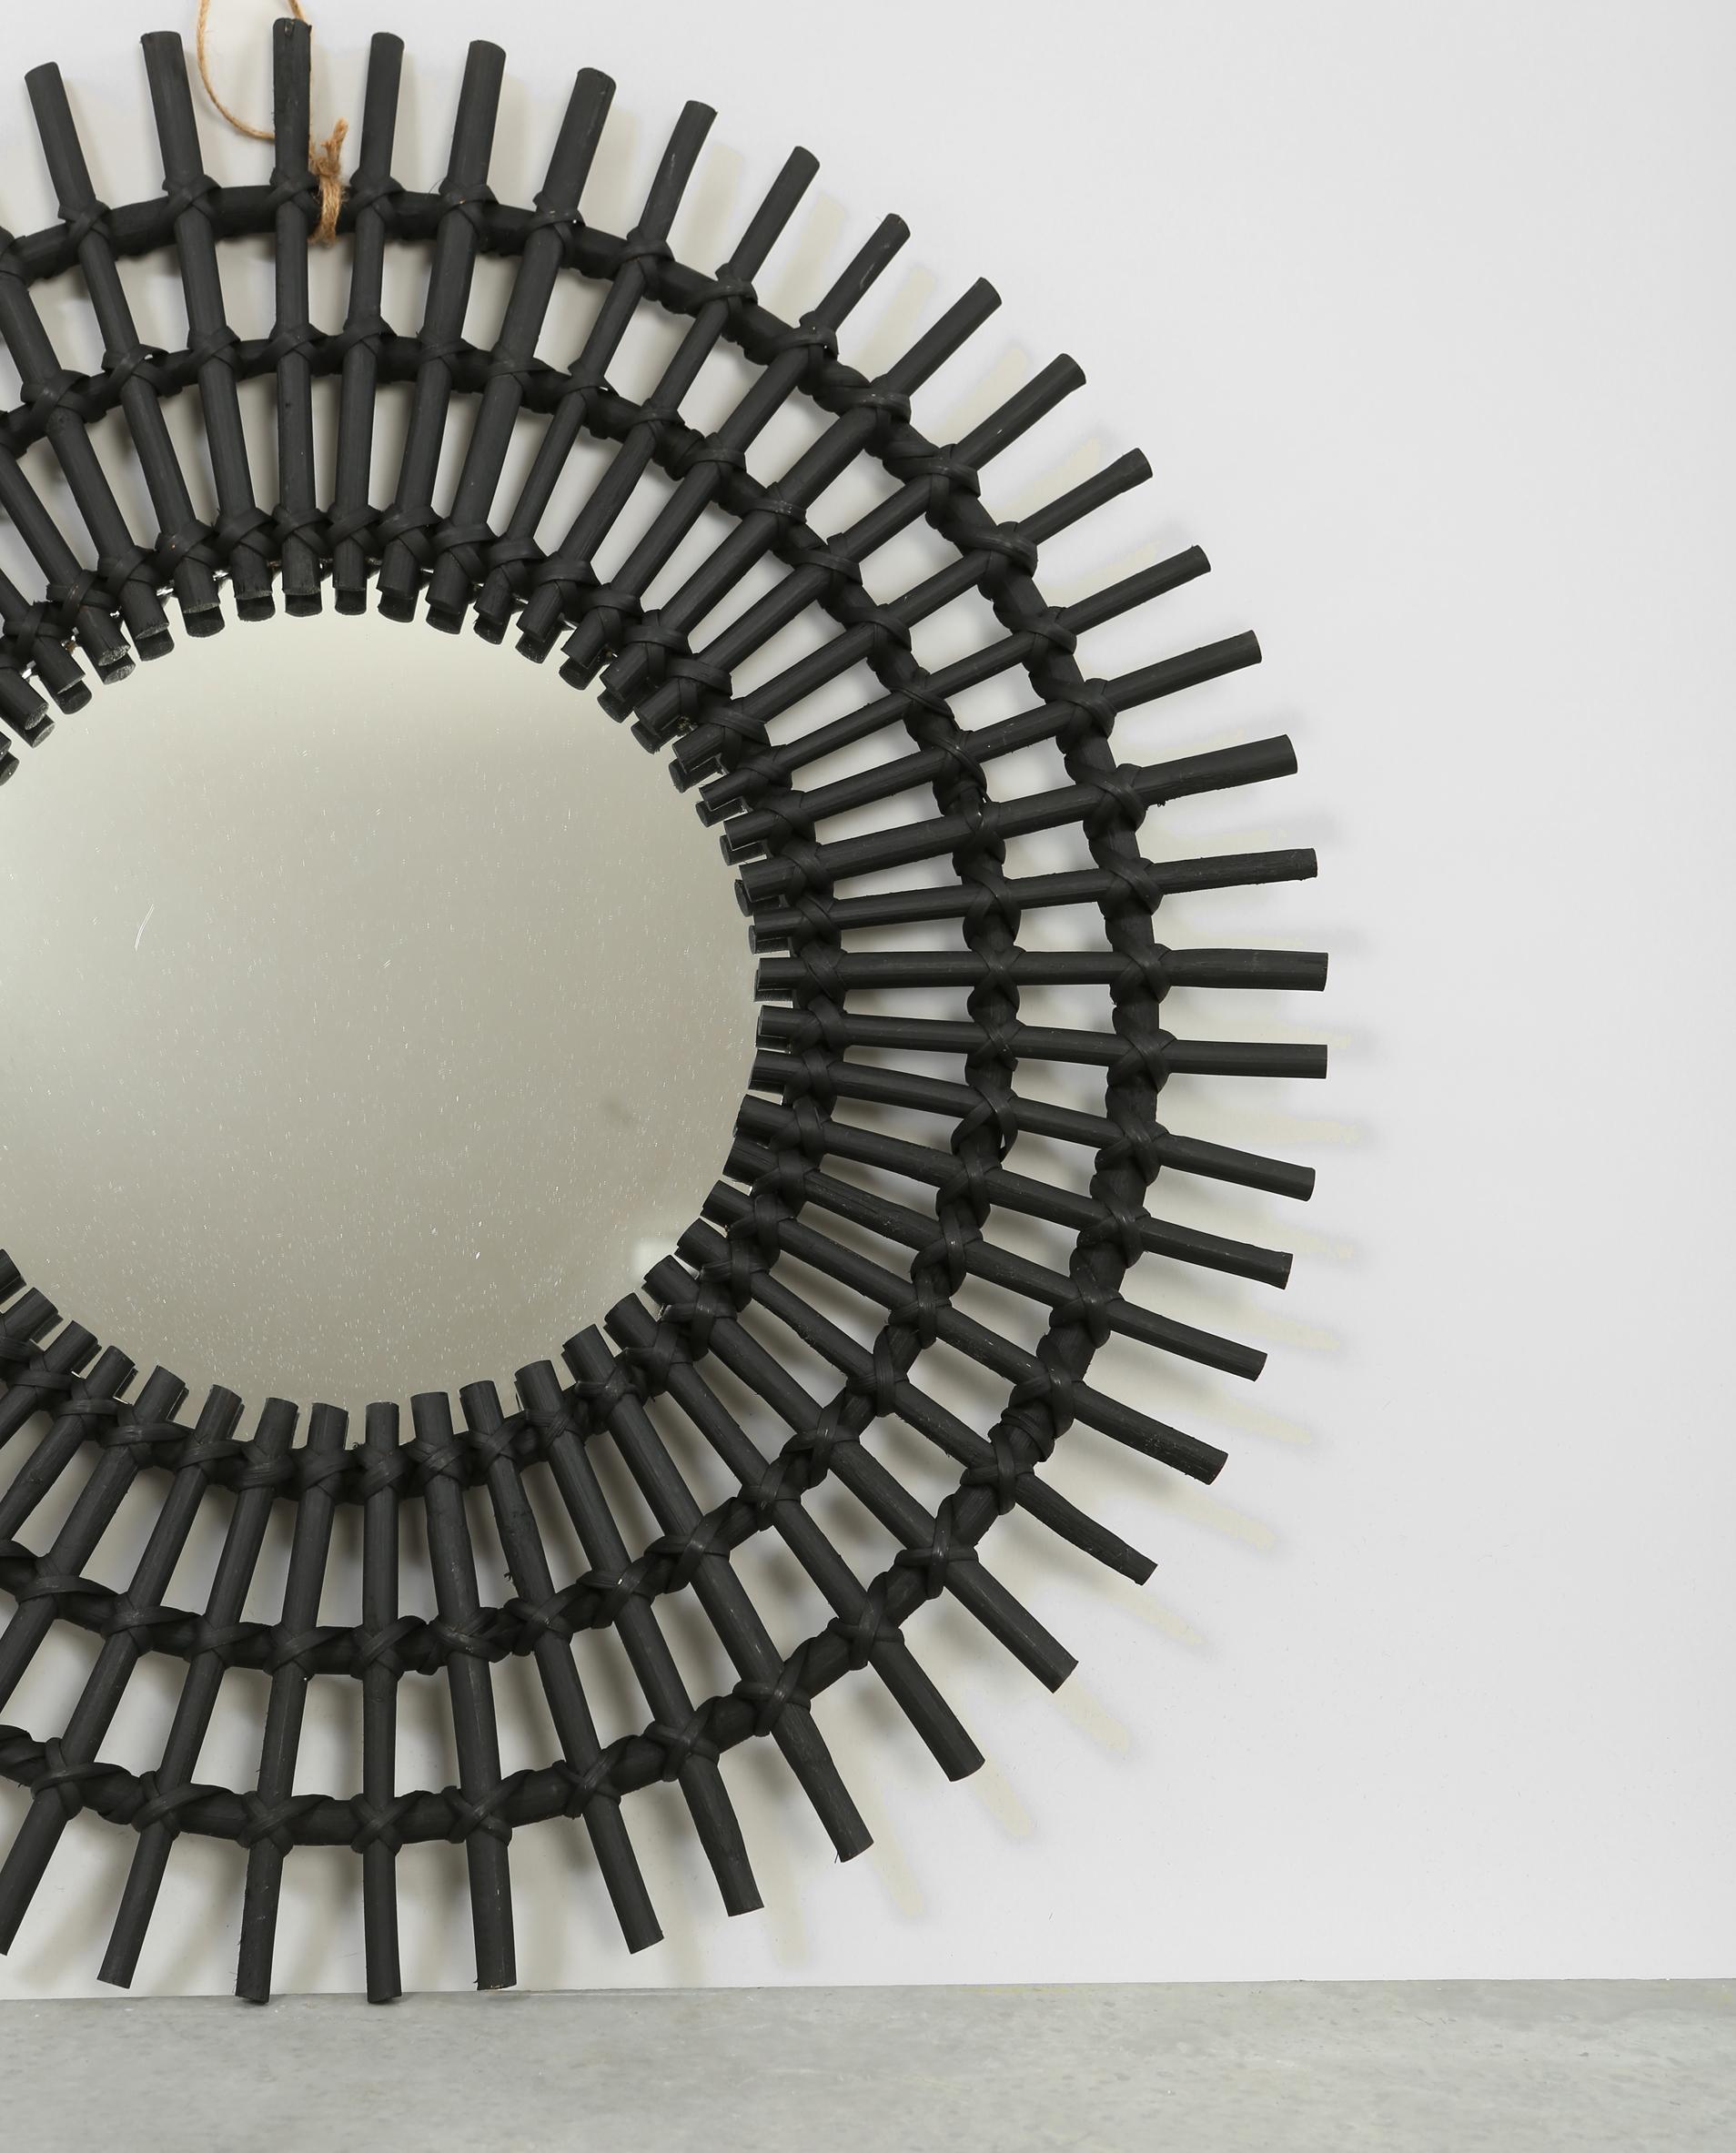 Miroir soleil en rotin noir 902206899a07 pimkie for Miroir rectangulaire en rotin